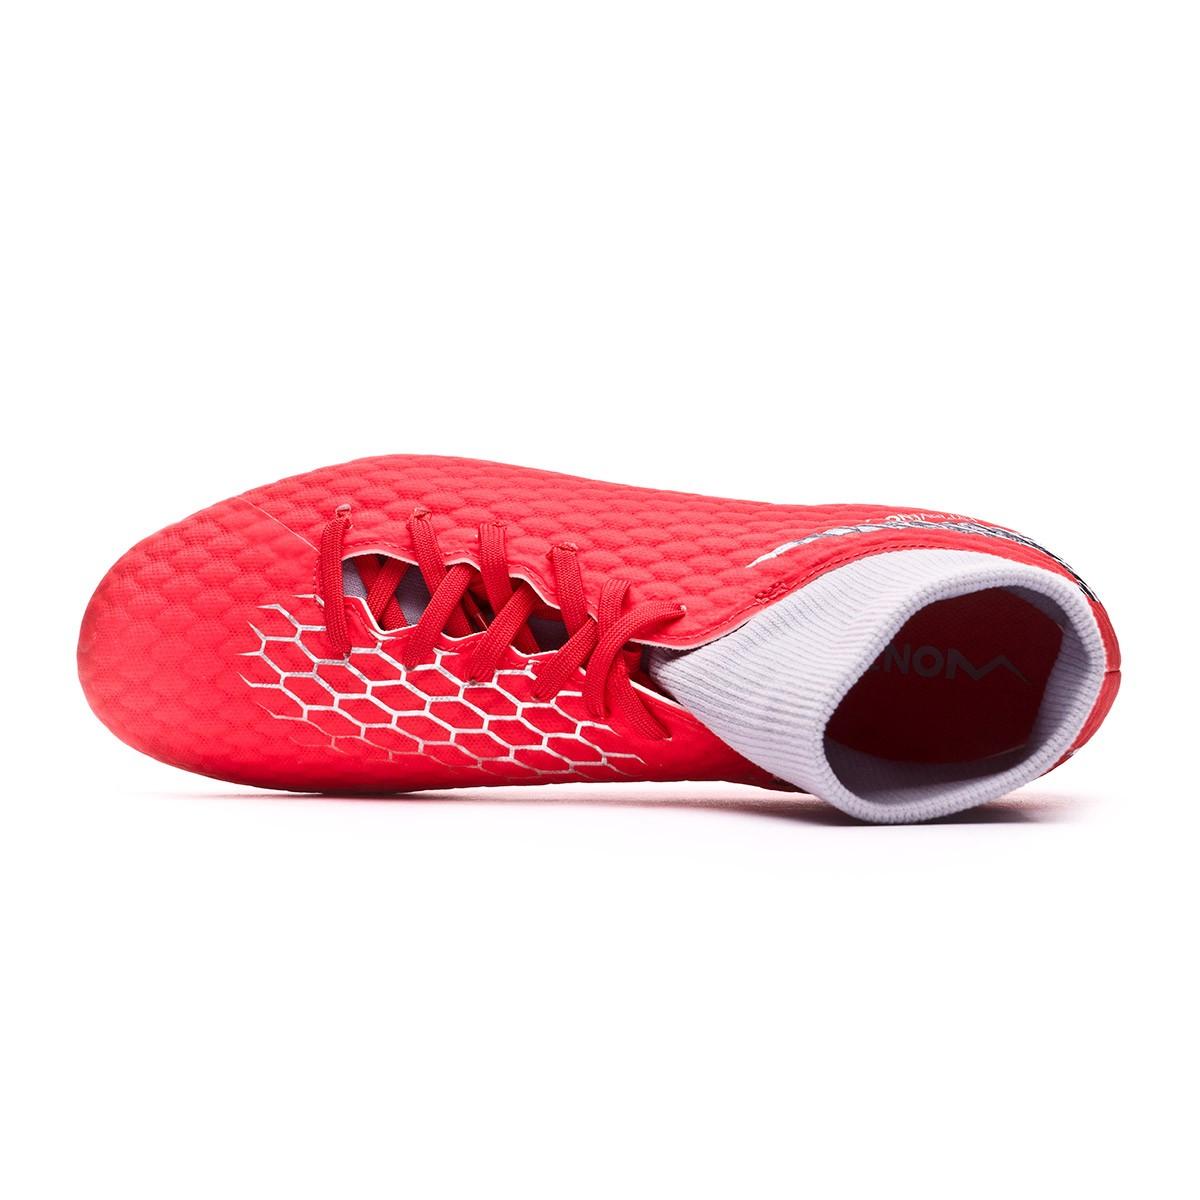 new style 976df fcf1f Chaussure de foot Nike Hypervenom Phantom III Academy DF FG Light crimson-Metallic  dark grey-Wolf grey - Boutique de football Fútbol Emotion